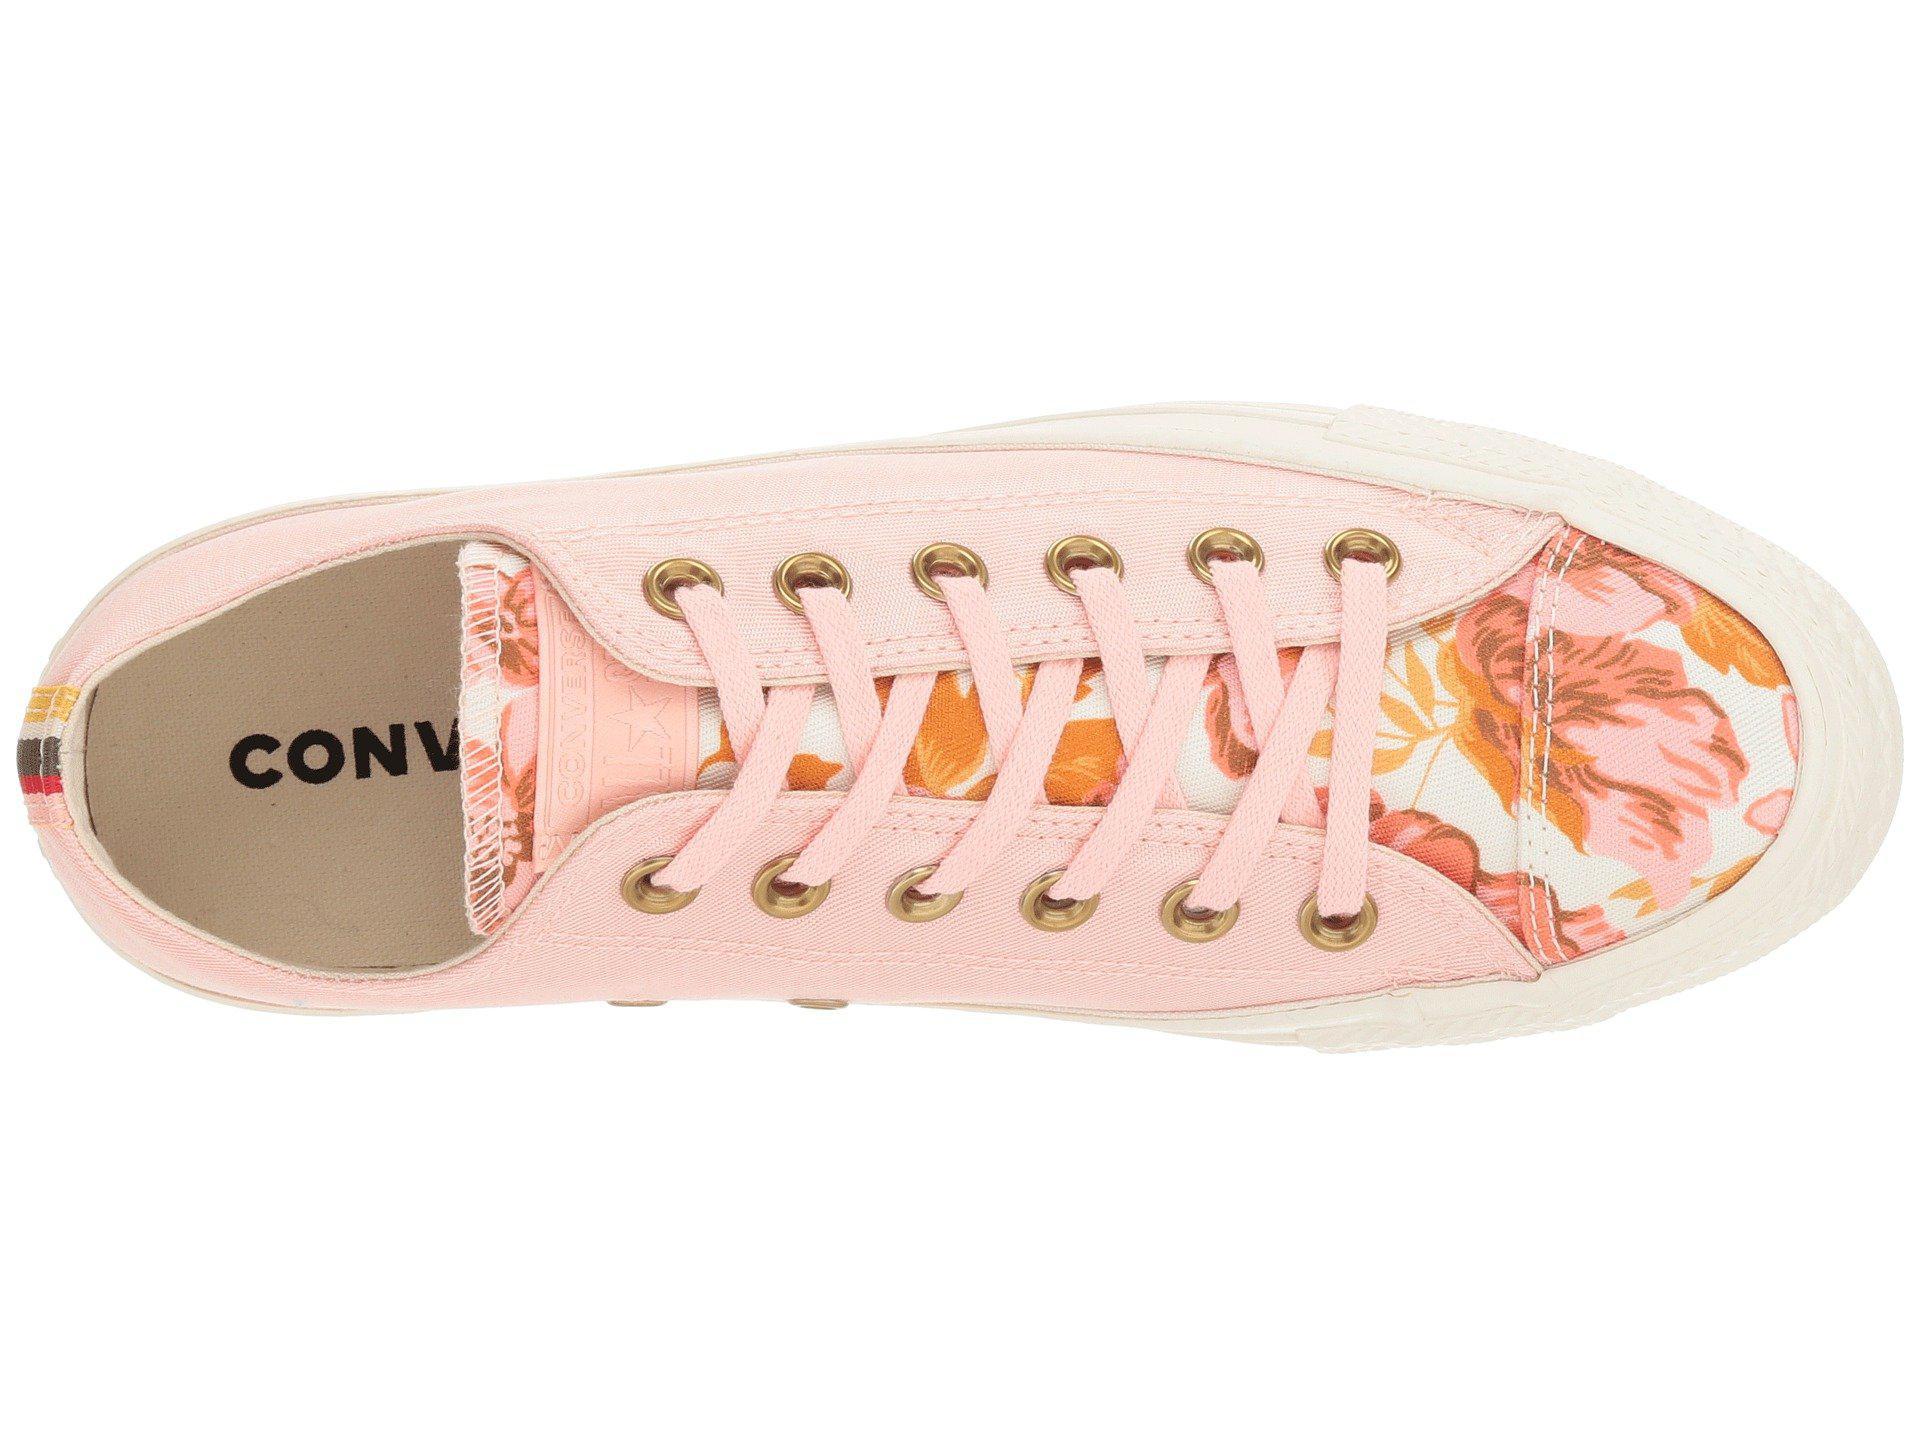 b9fd2e0f5b31 Converse - Pink Chuck Taylor All Star - Parkway Floral Ox - Lyst. View  fullscreen